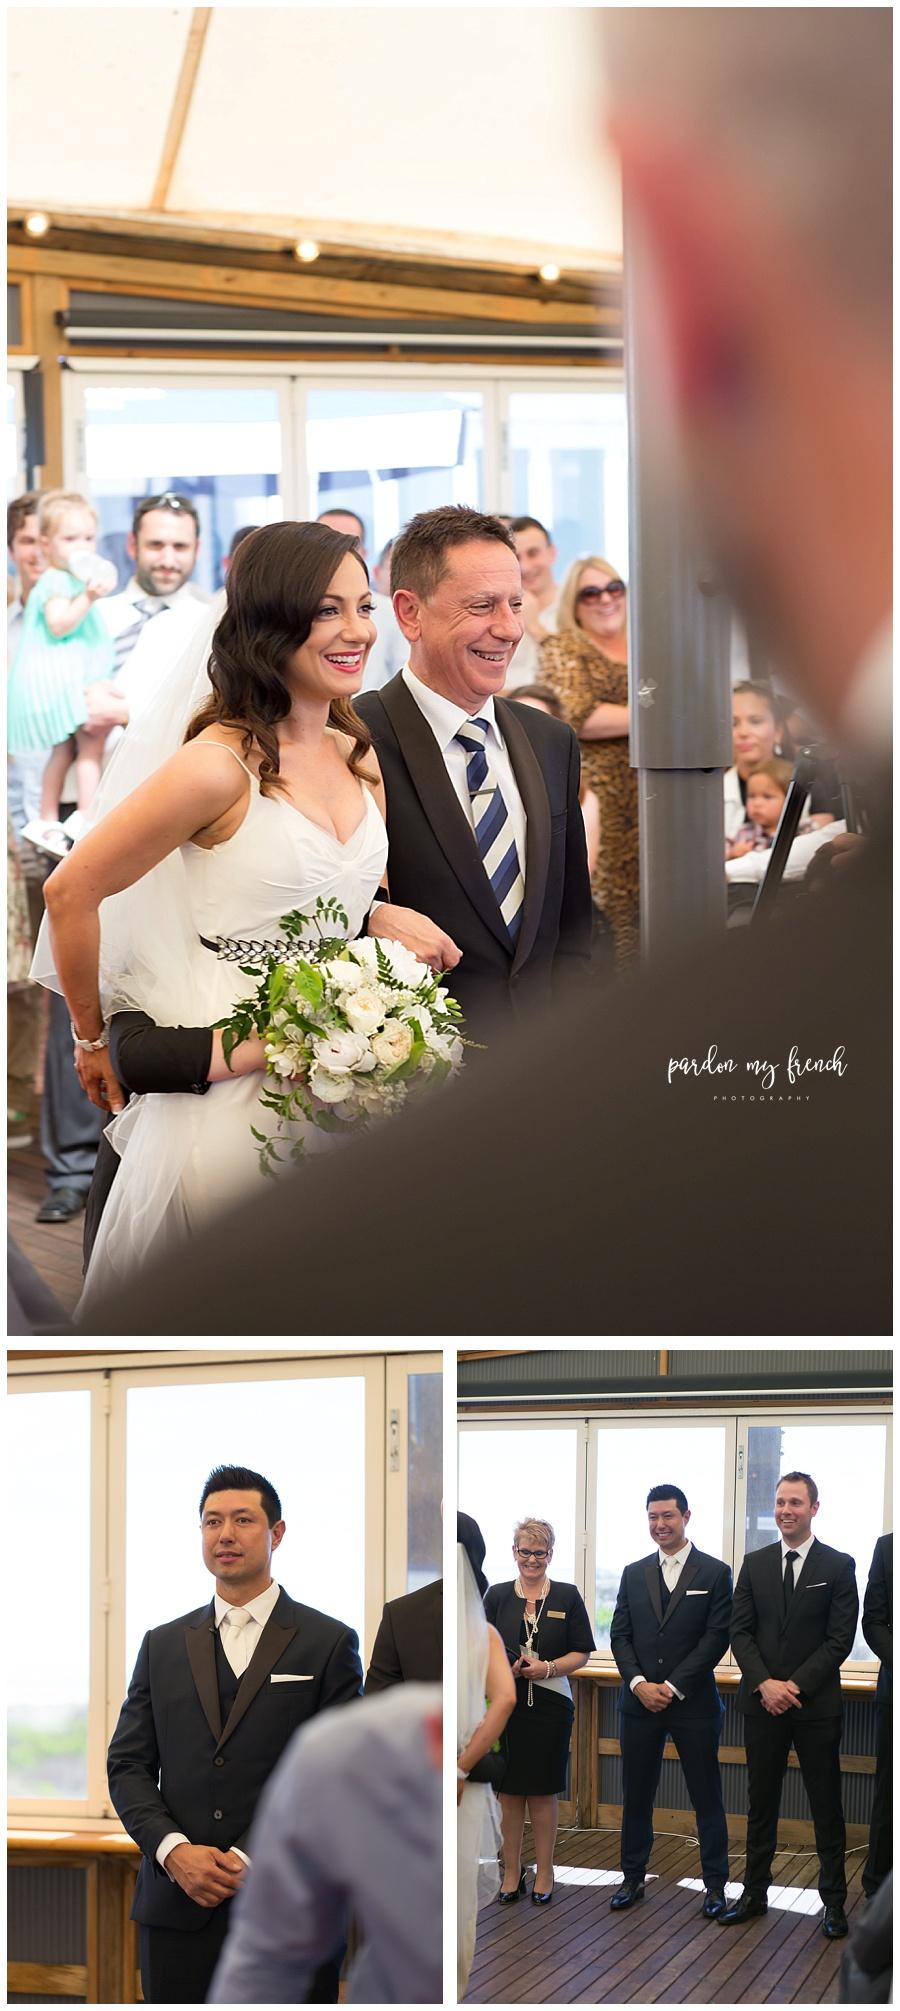 Adelaide Wedding Photographer 46.jpg